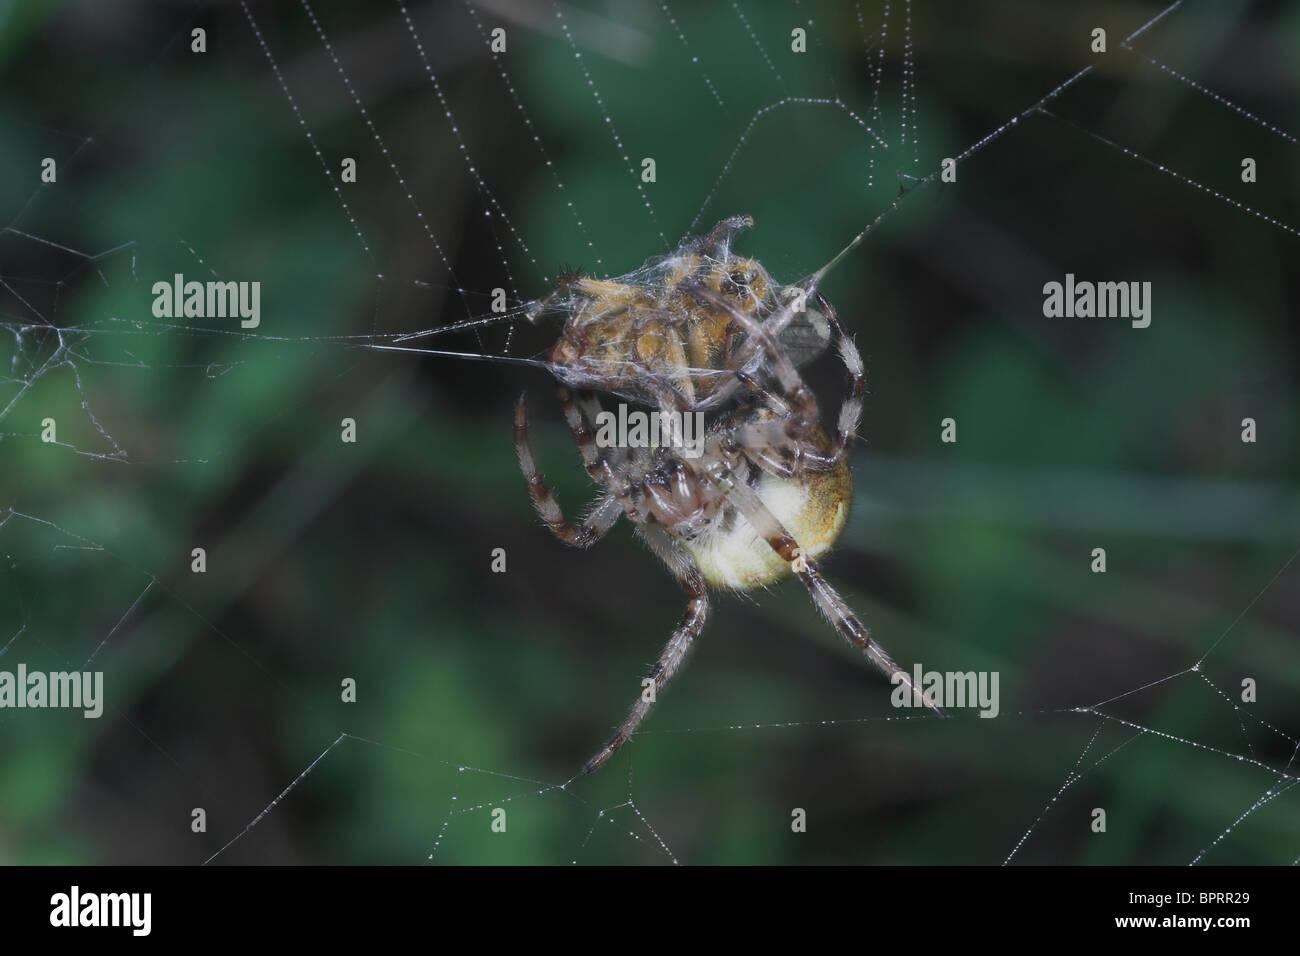 Spider with captured prey on orb web. Somerset. UK - Stock Image